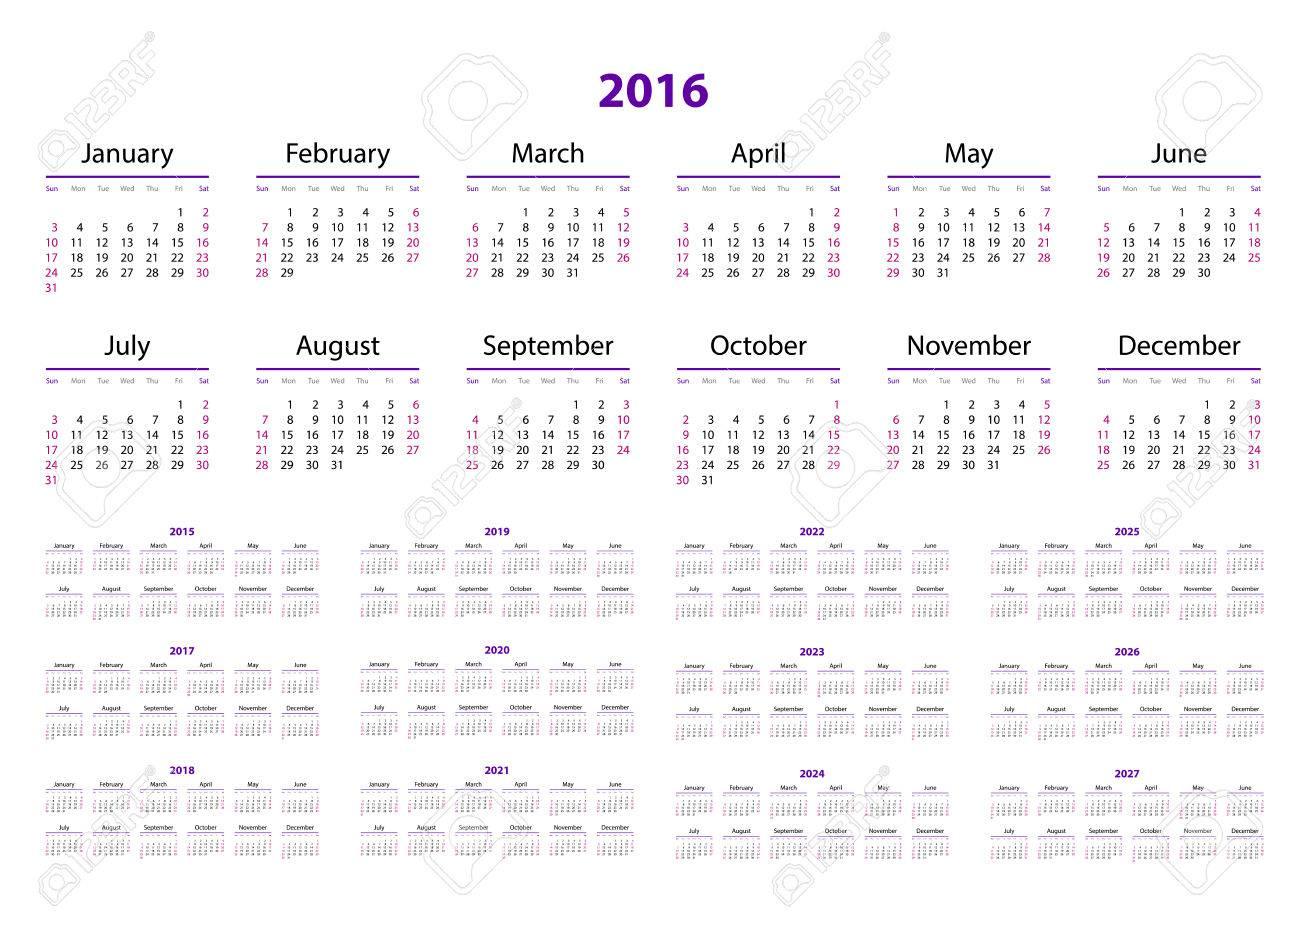 calendar 2015 2016 2017 2018 2019 2020 2021 2022 2023 3 year